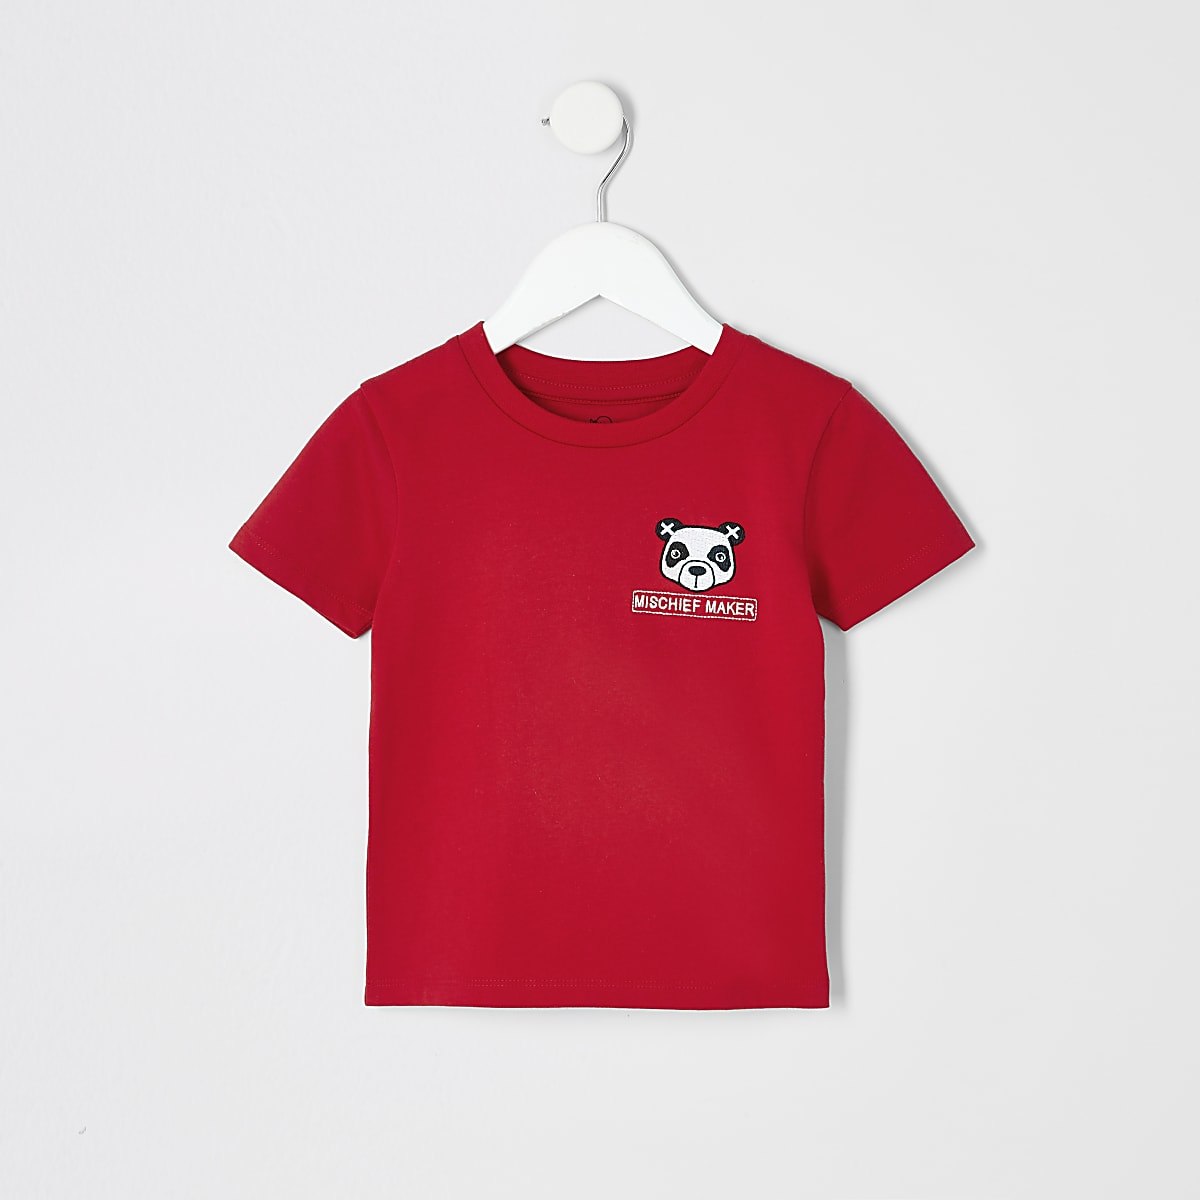 U99oi-9 Long Sleeve Cotton Bodysuit for Baby Boys and Girls Cute Somalia Flag Playsuit